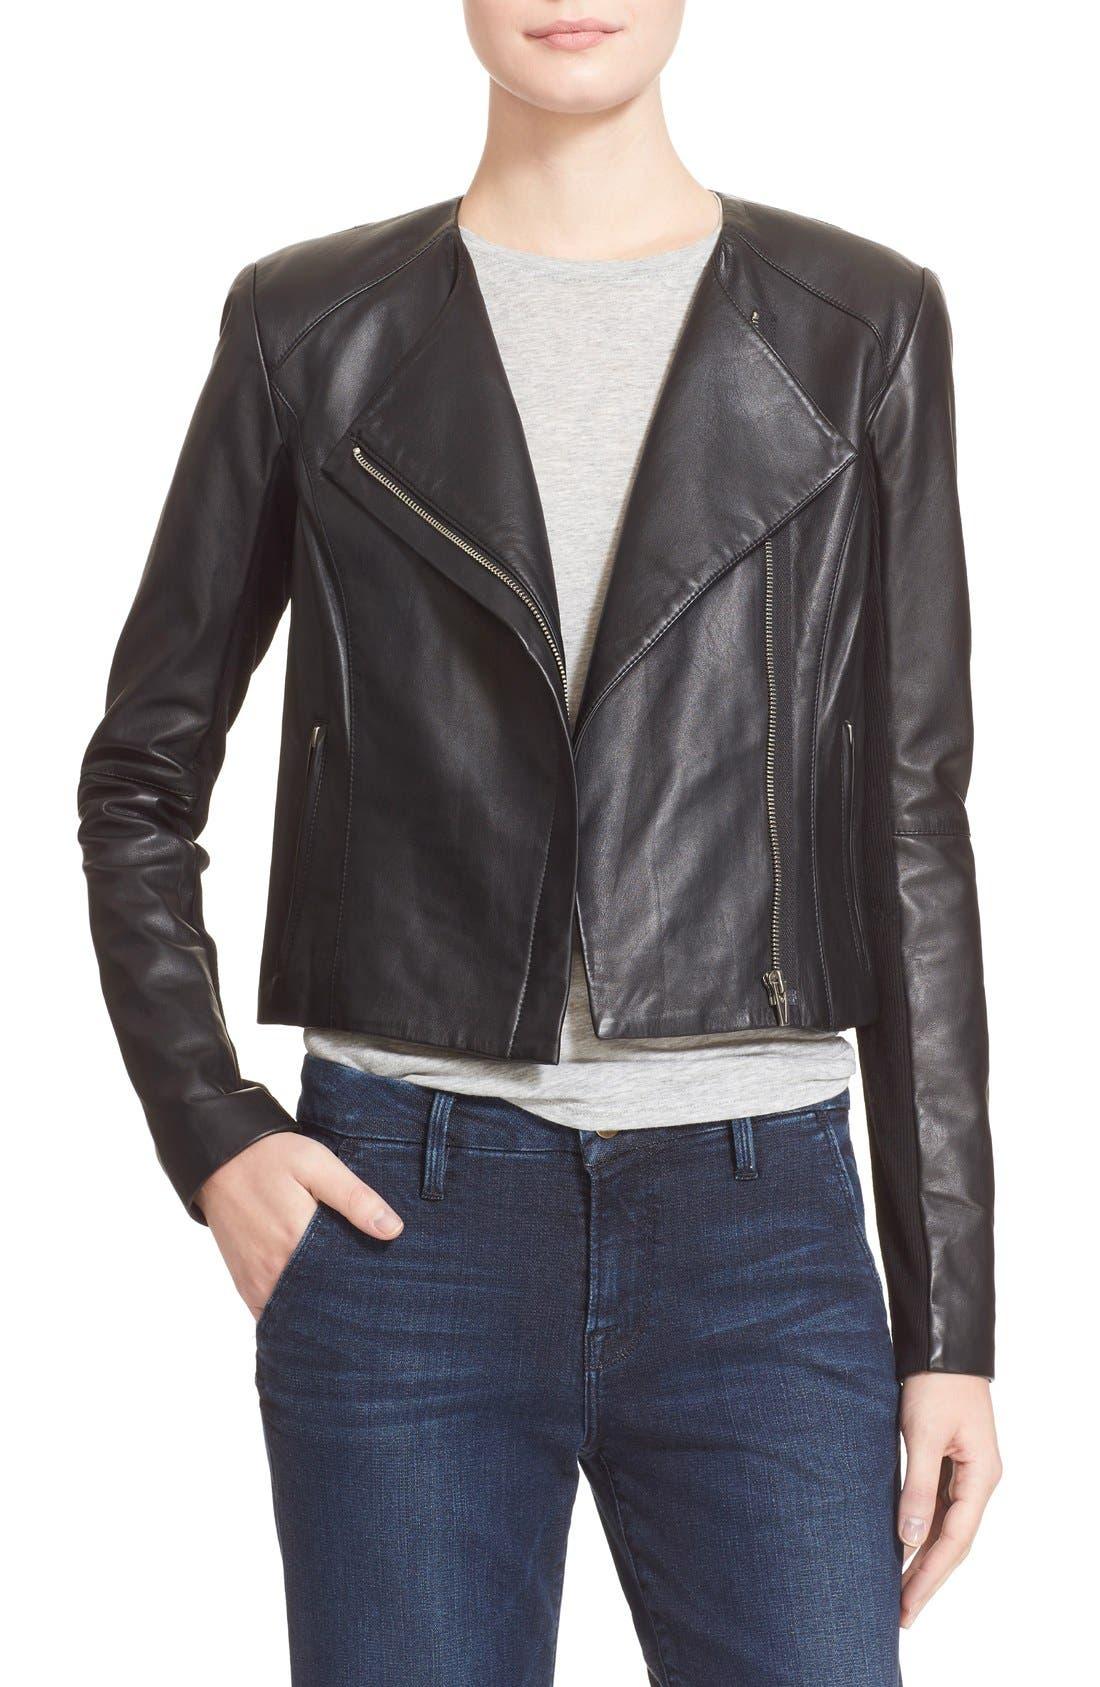 VEDA 'Dali' Leather Jacket, Main, color, 001